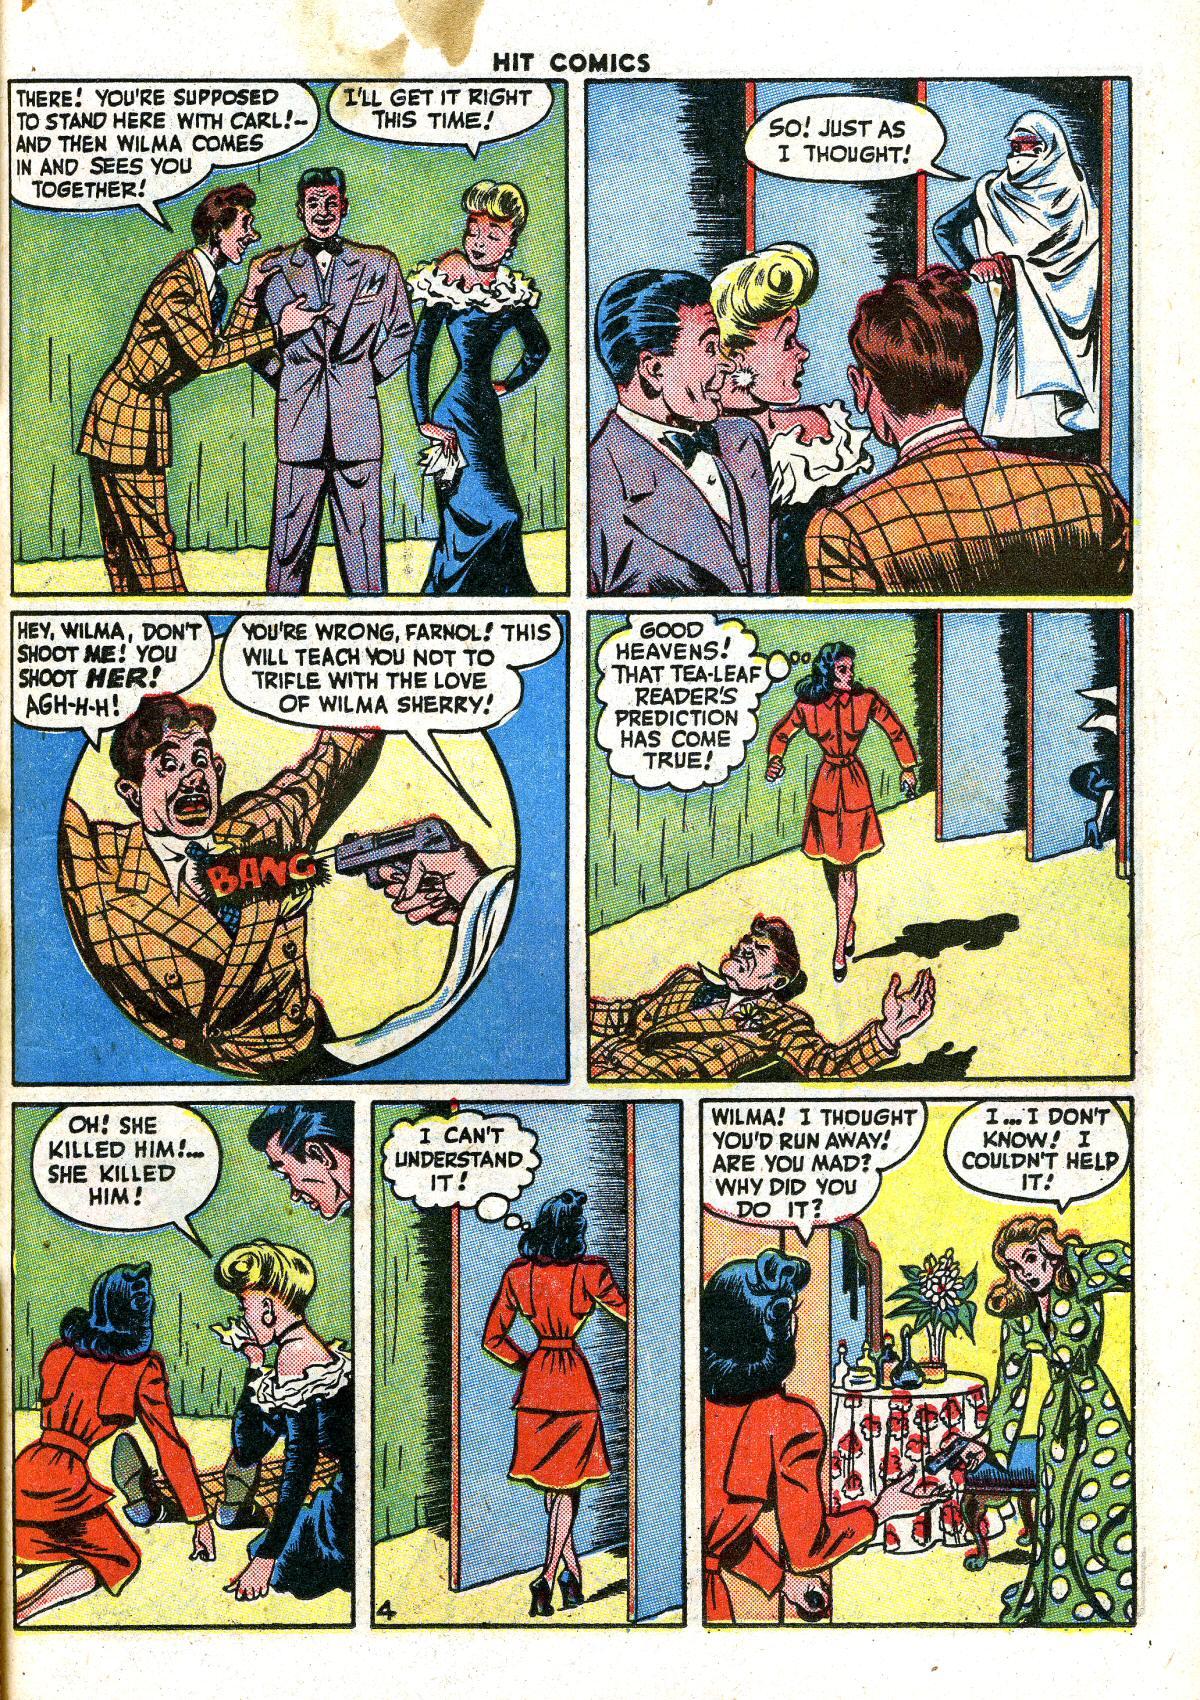 Read online Hit Comics comic -  Issue #41 - 33